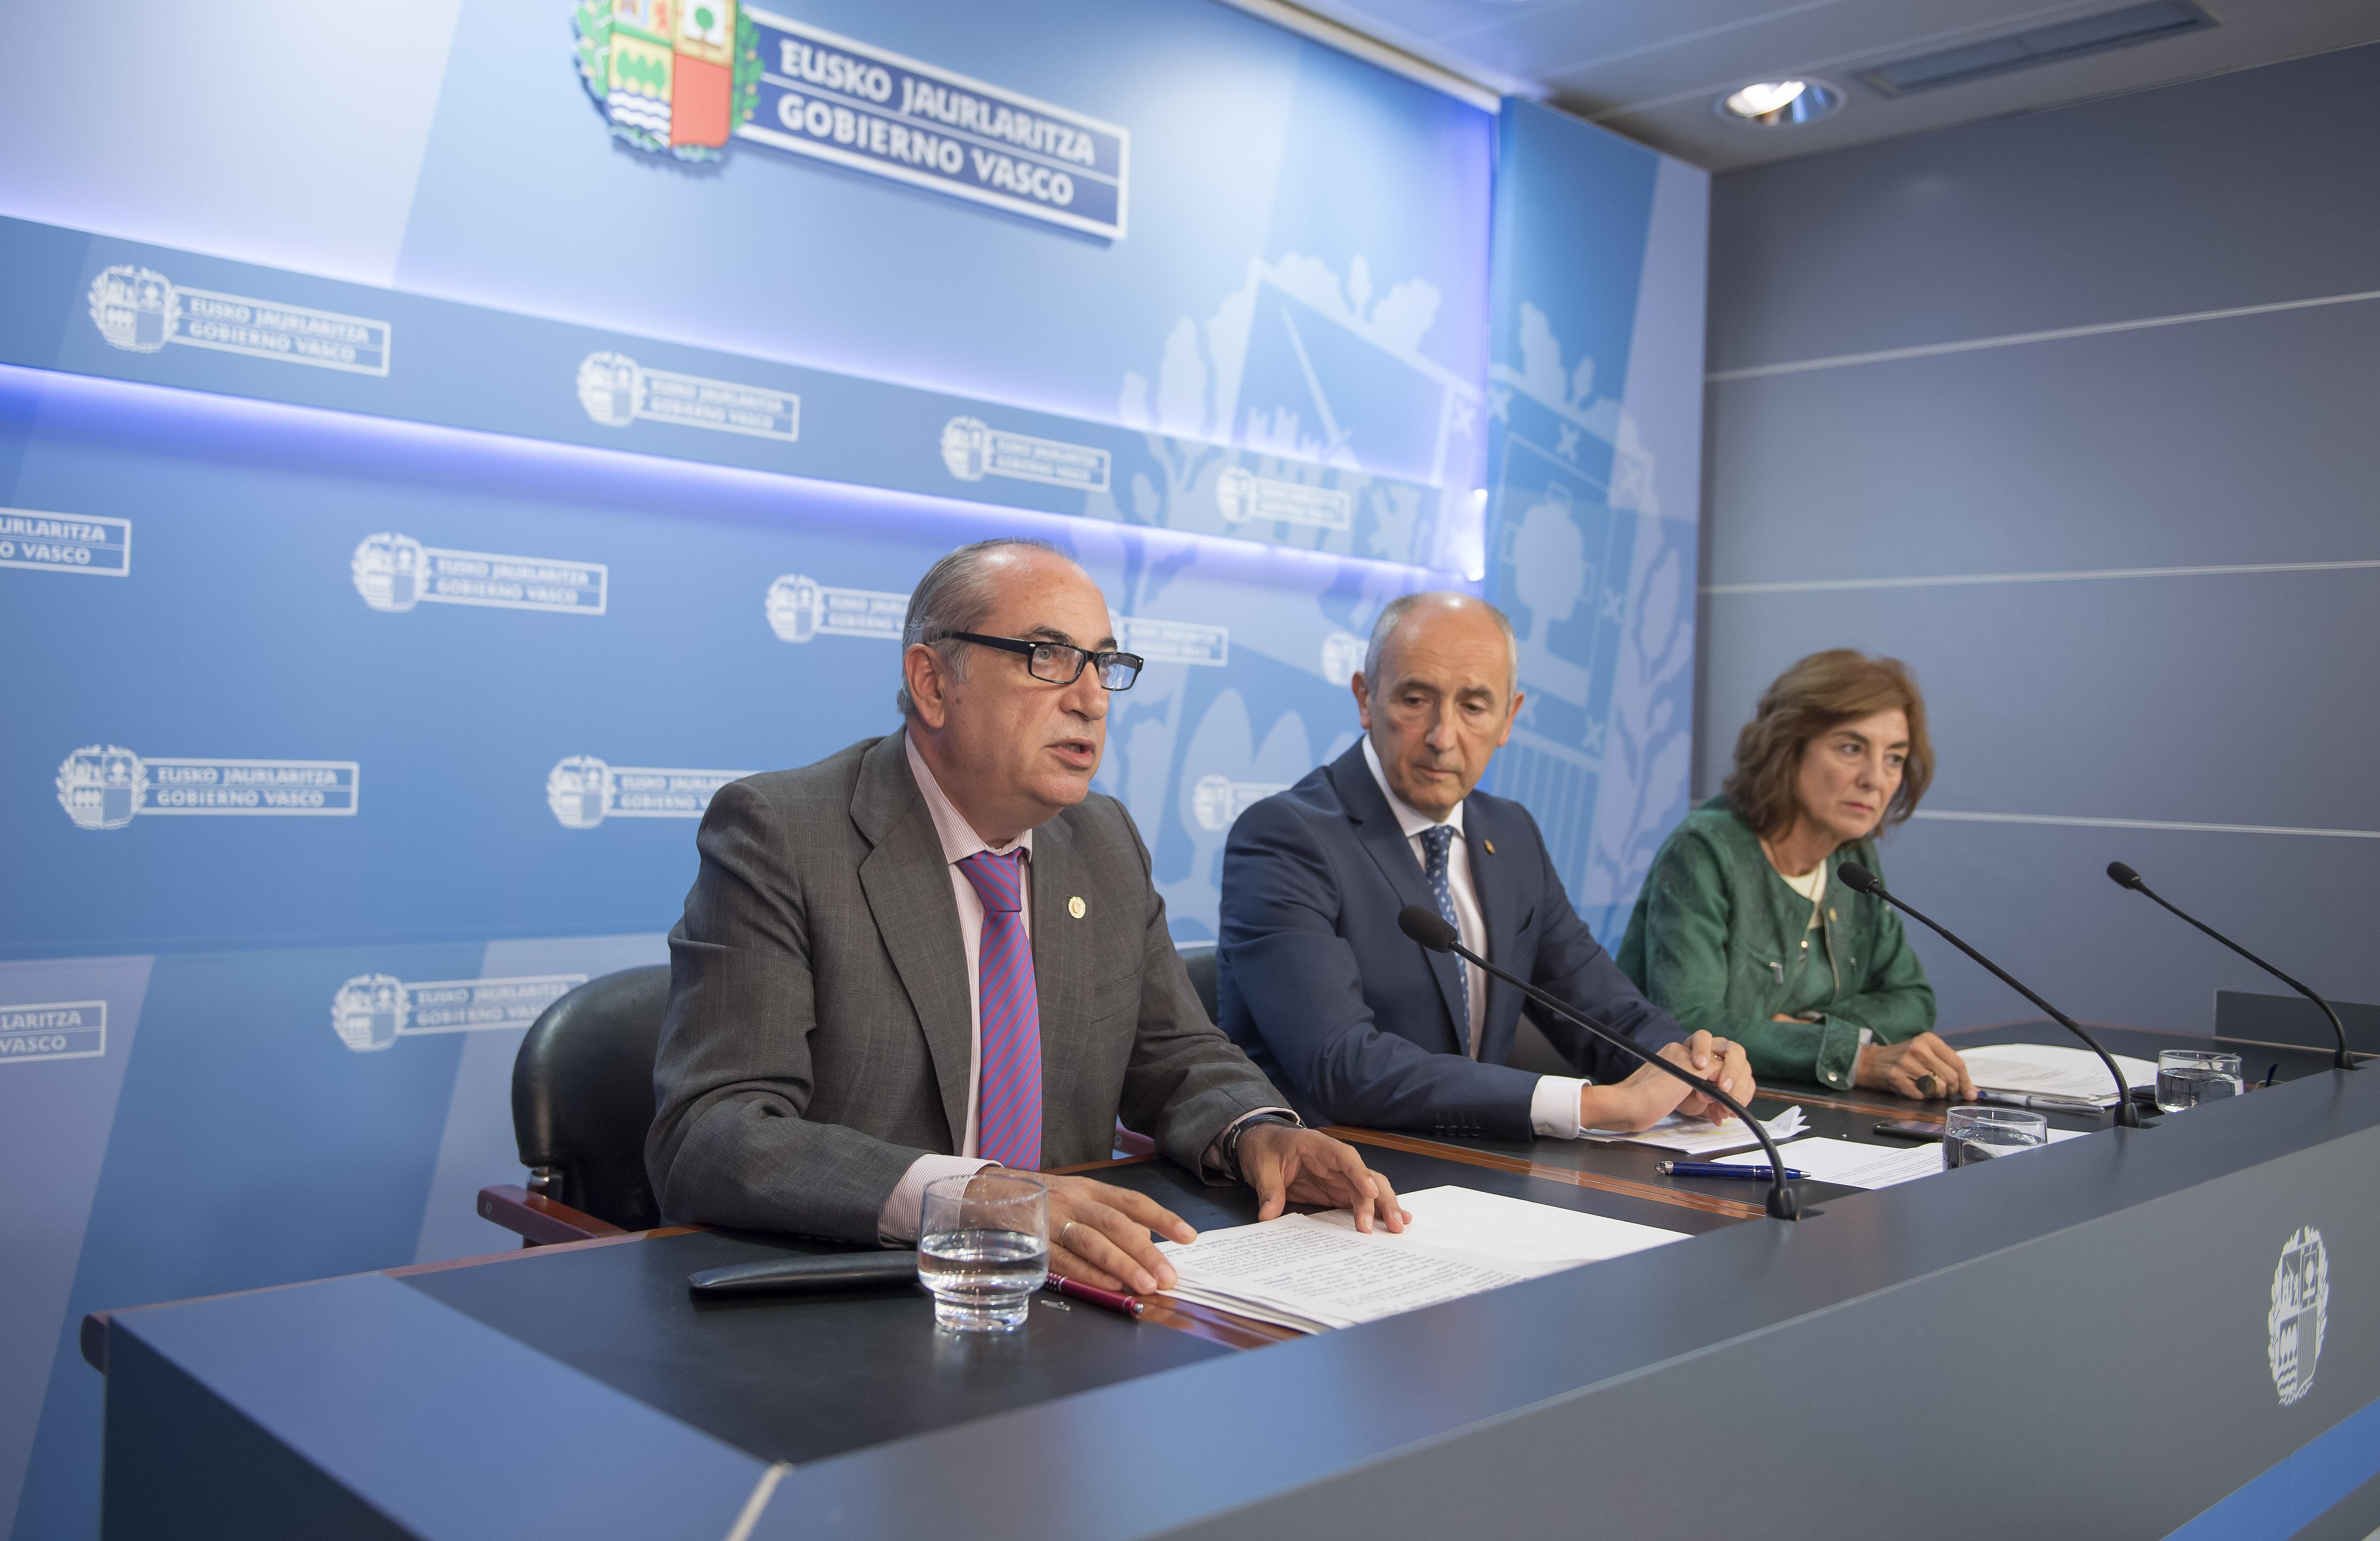 2017_09_12_consejo_gobierno.jpg